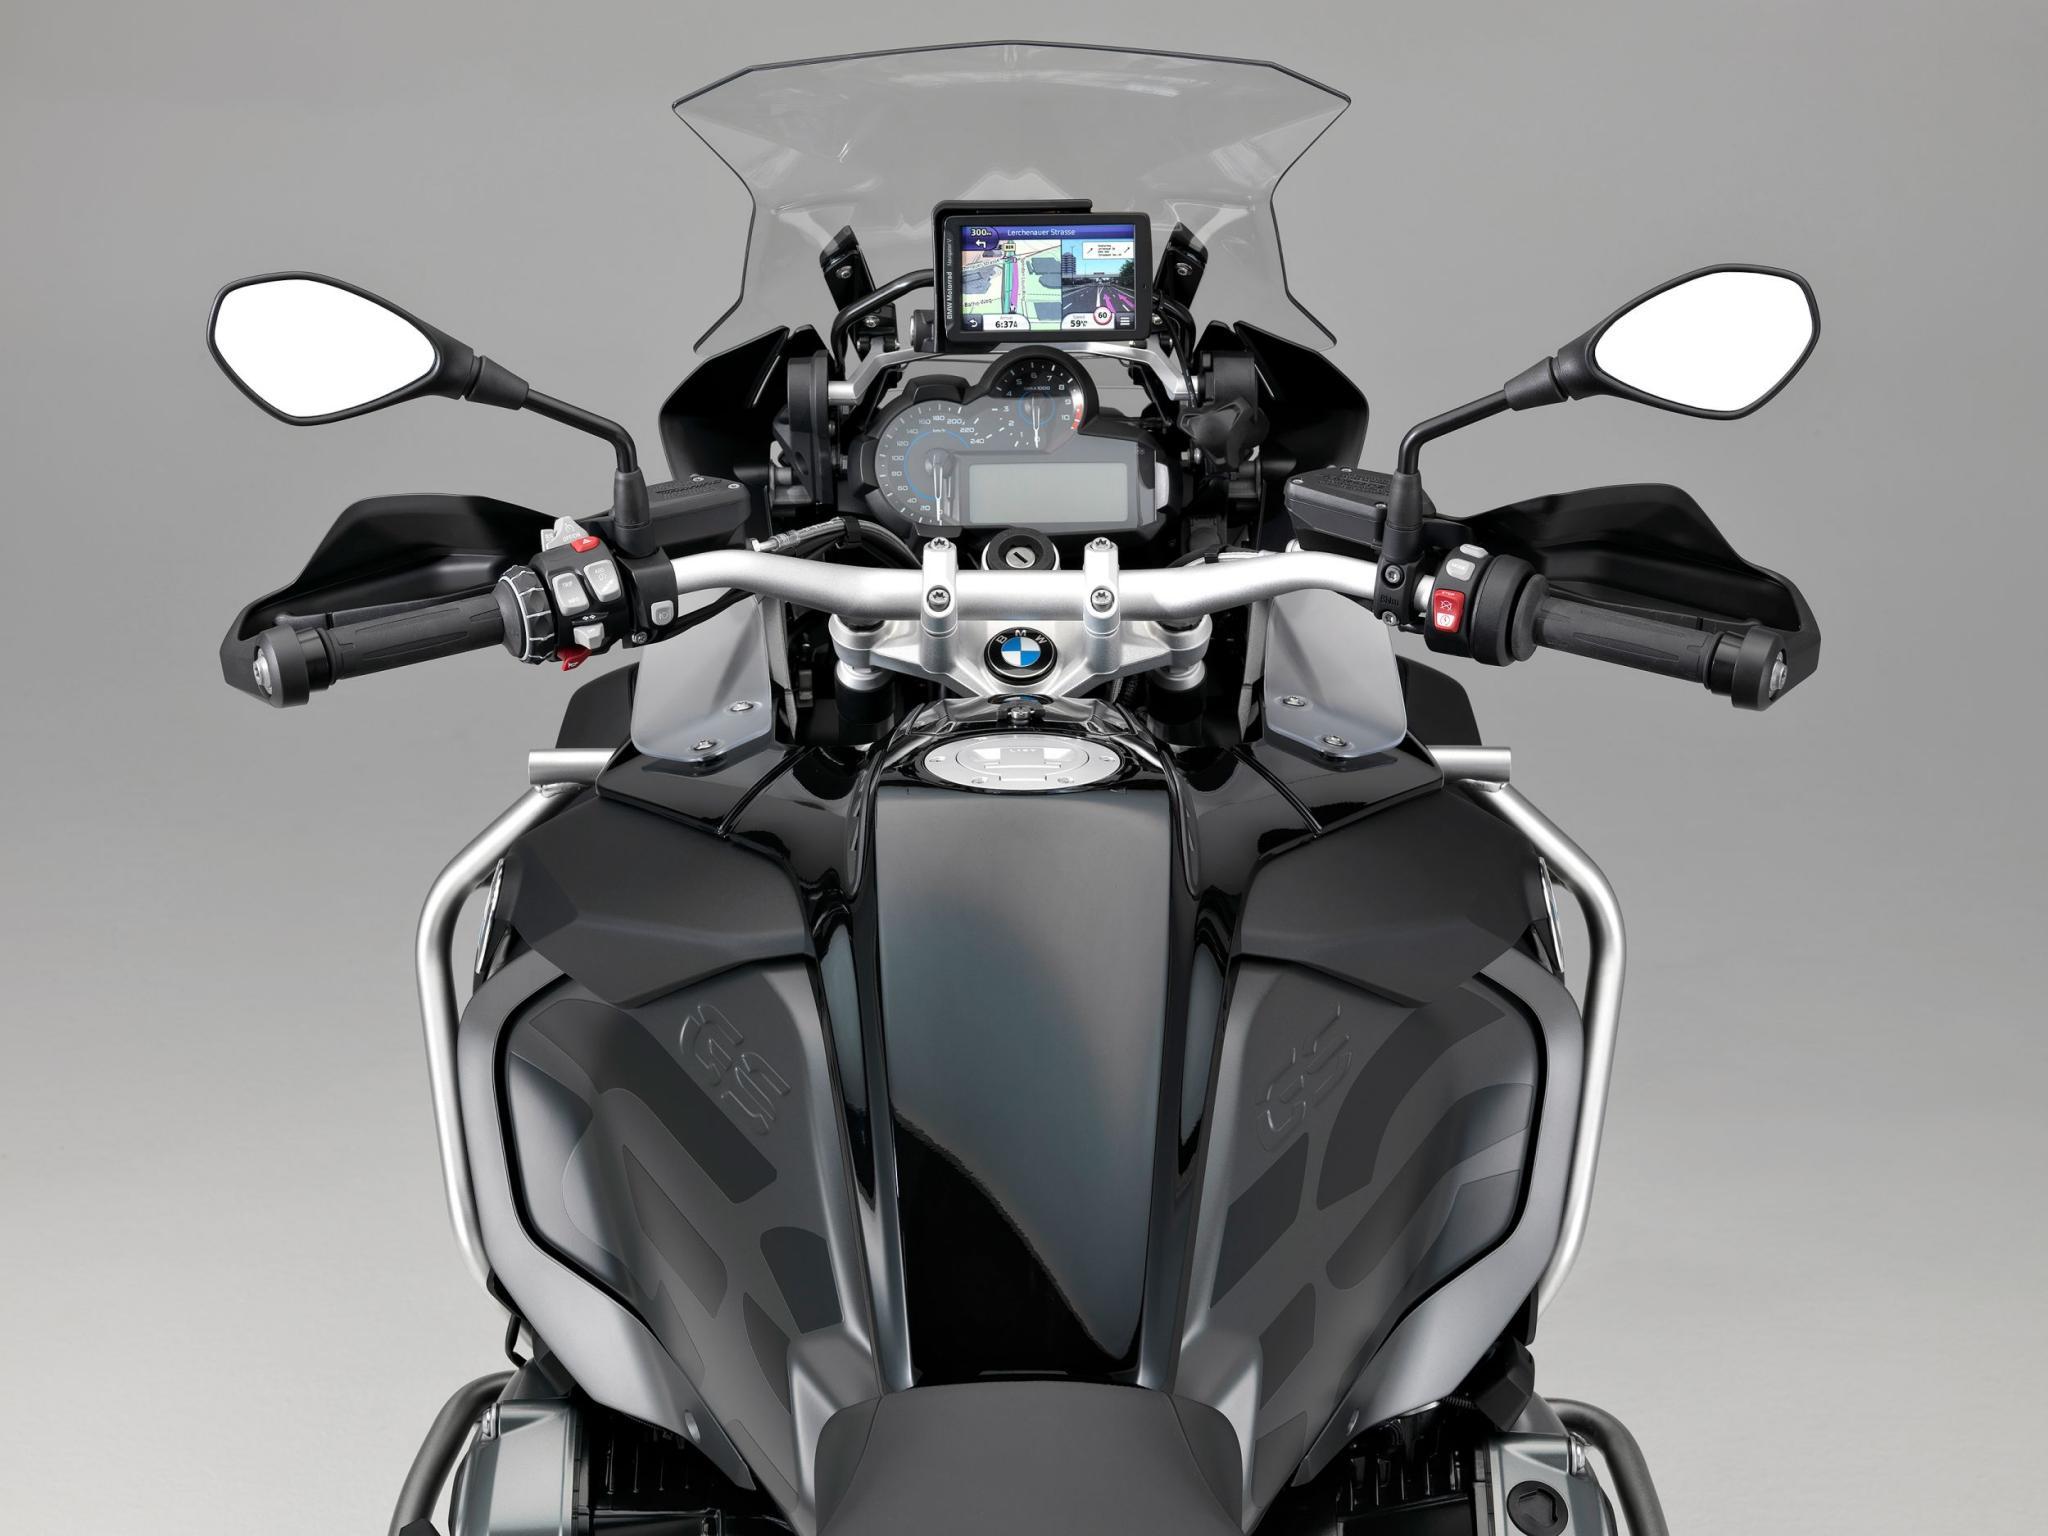 neue bmw modelle f r 2017 motorrad fotos motorrad bilder. Black Bedroom Furniture Sets. Home Design Ideas